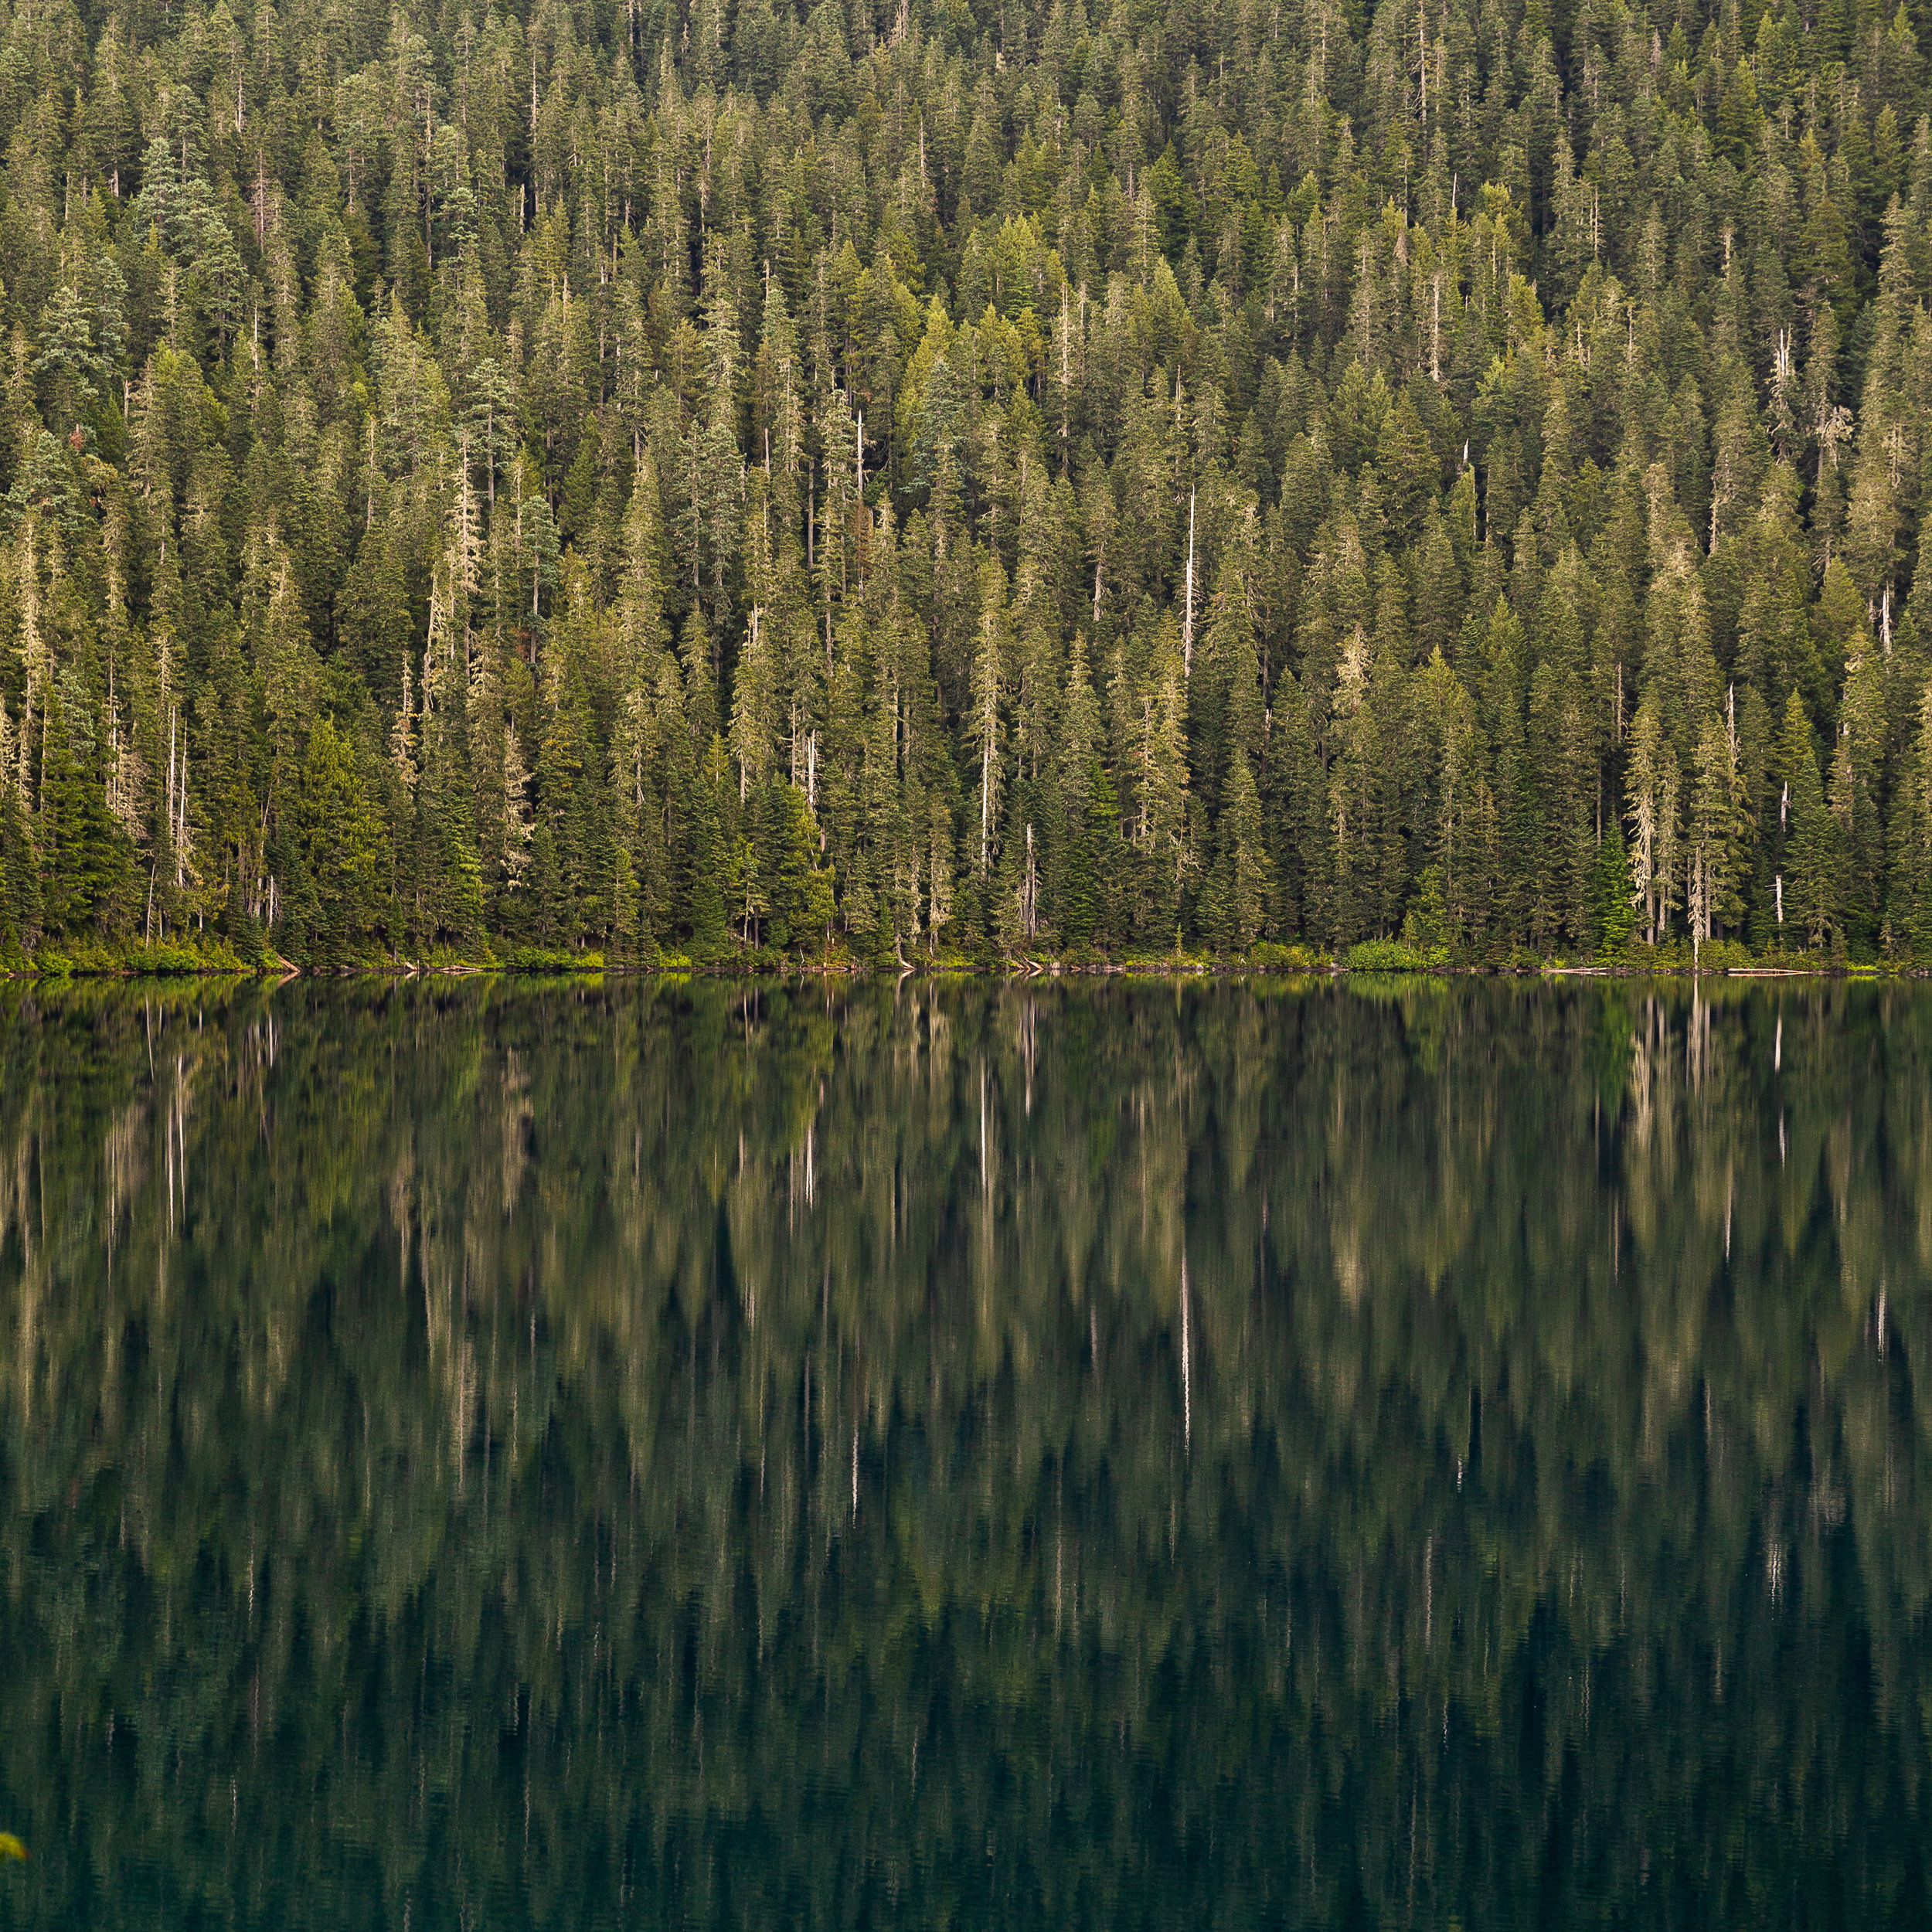 September 6 2019 mowich lake mt rainier carlos aventuras jenny l miller-132.jpg